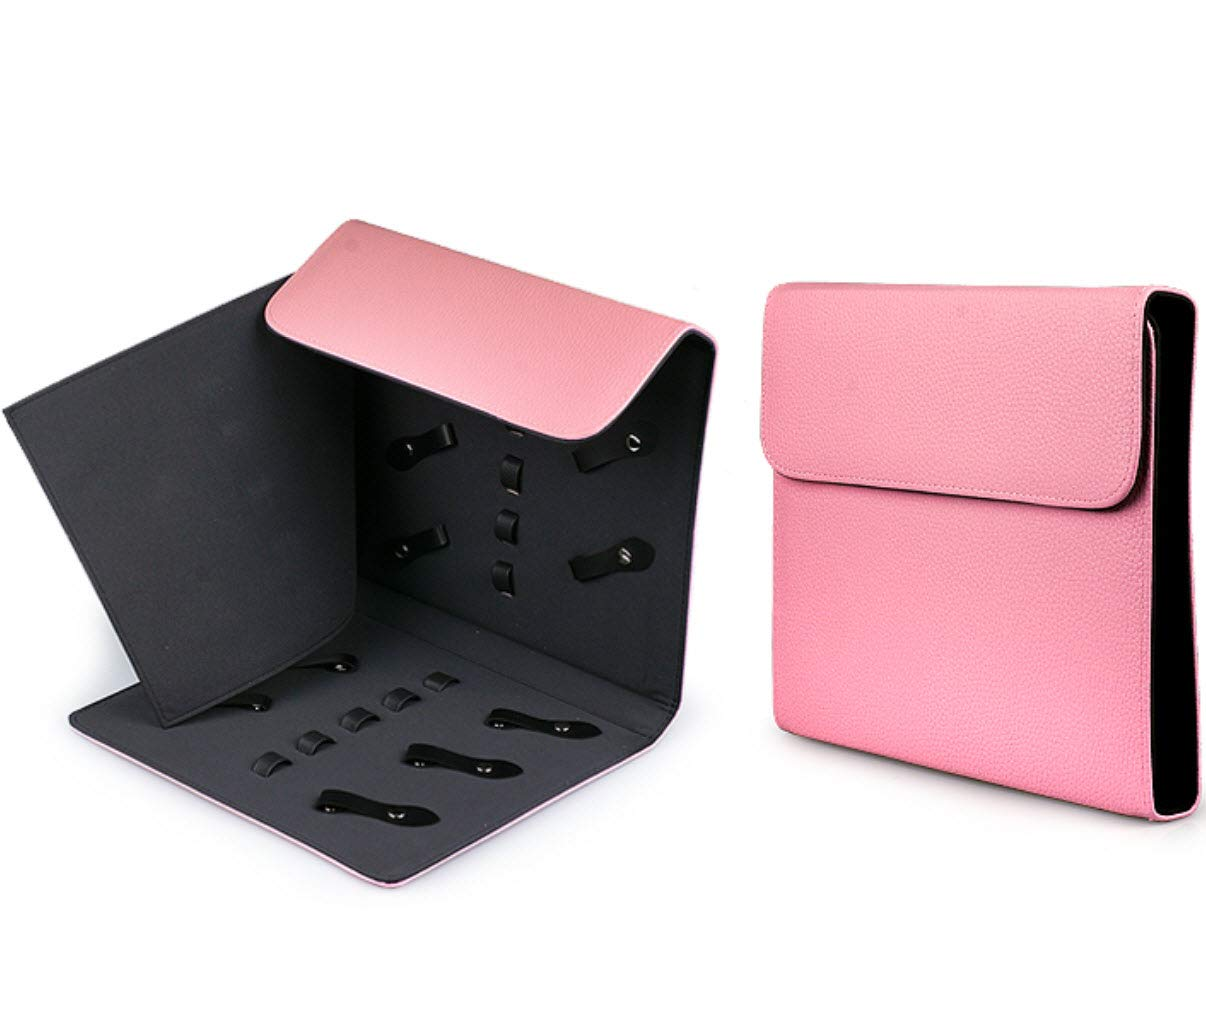 Truewin Hairdressing Scissors 10 Holders Display Case Bag Sample Board Shears (Pink)